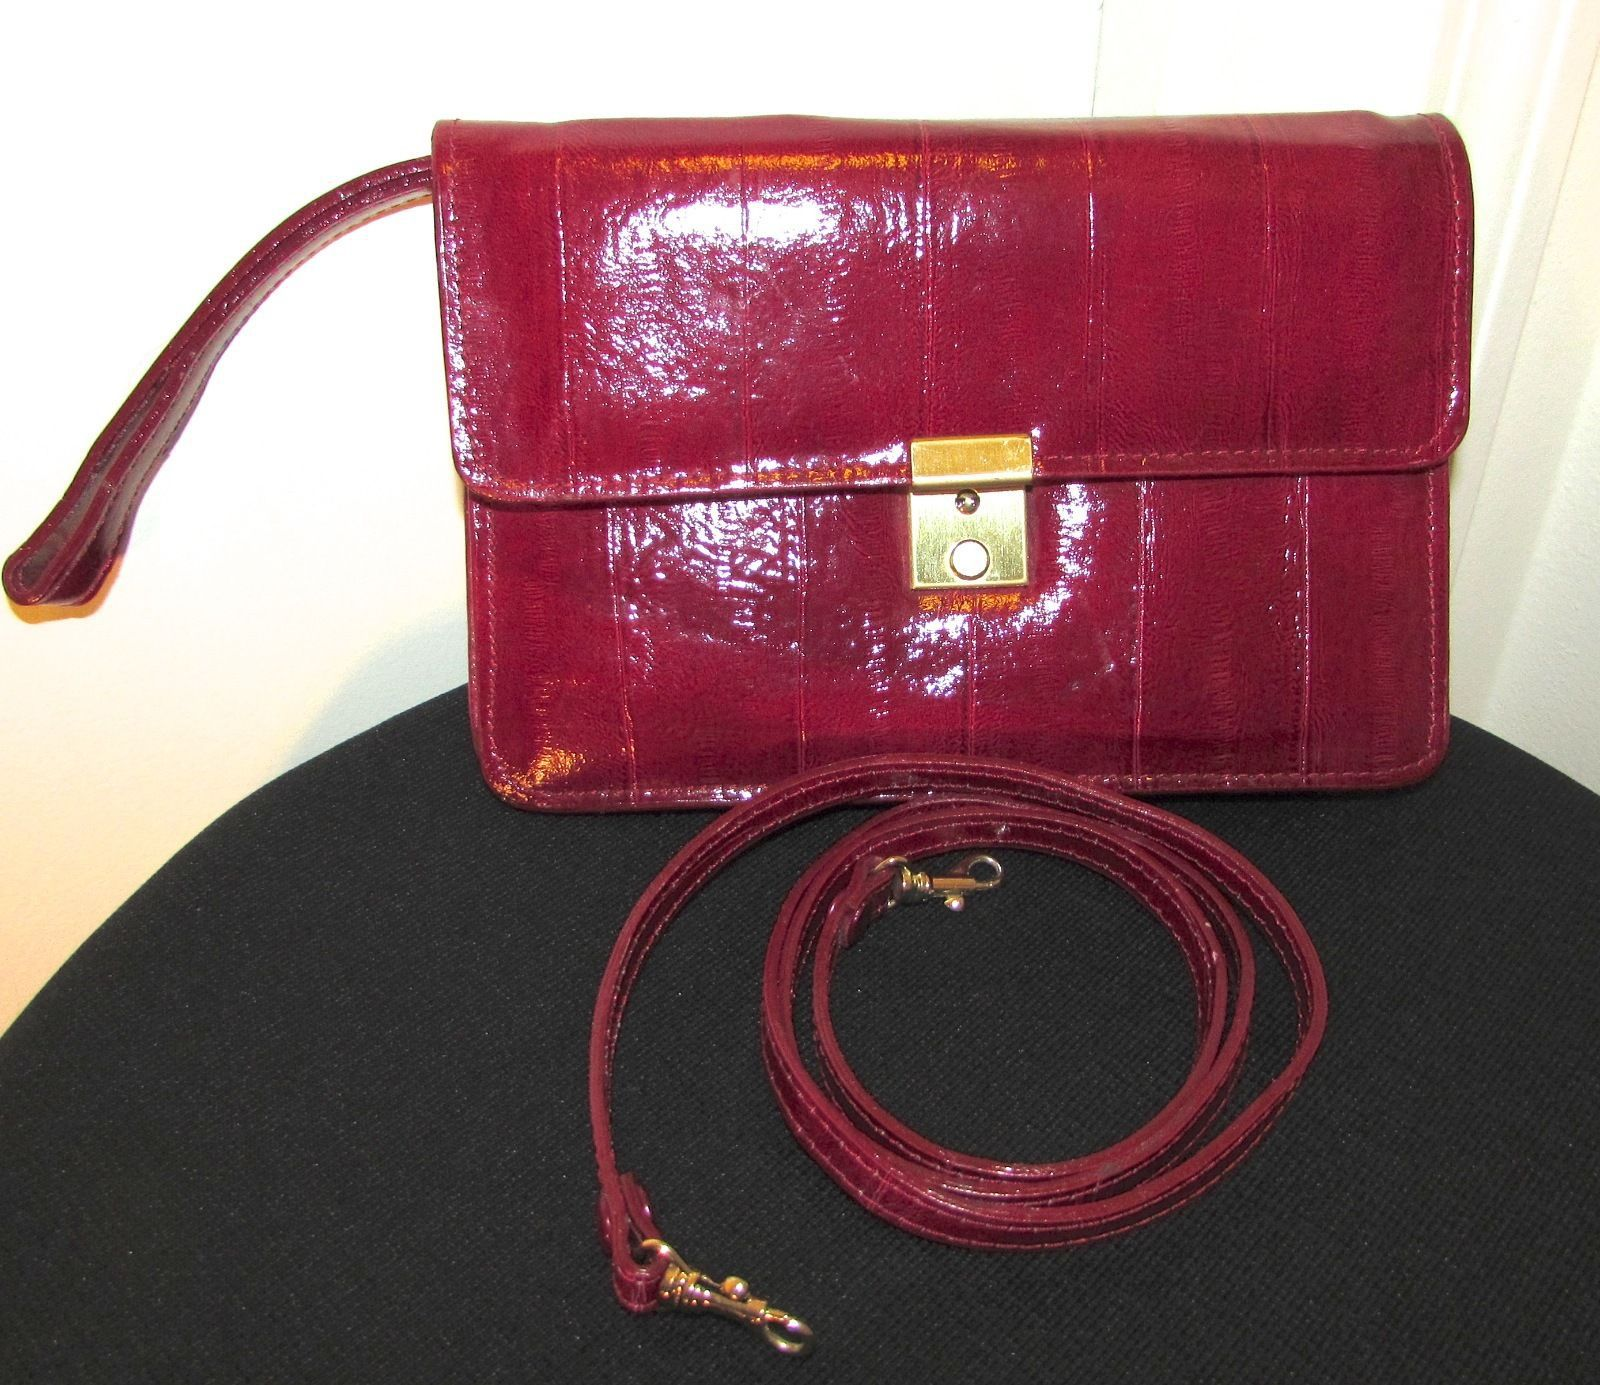 Vintage Vivace Ruby Red Embossed Leather Envelope Clutch Handbag Small